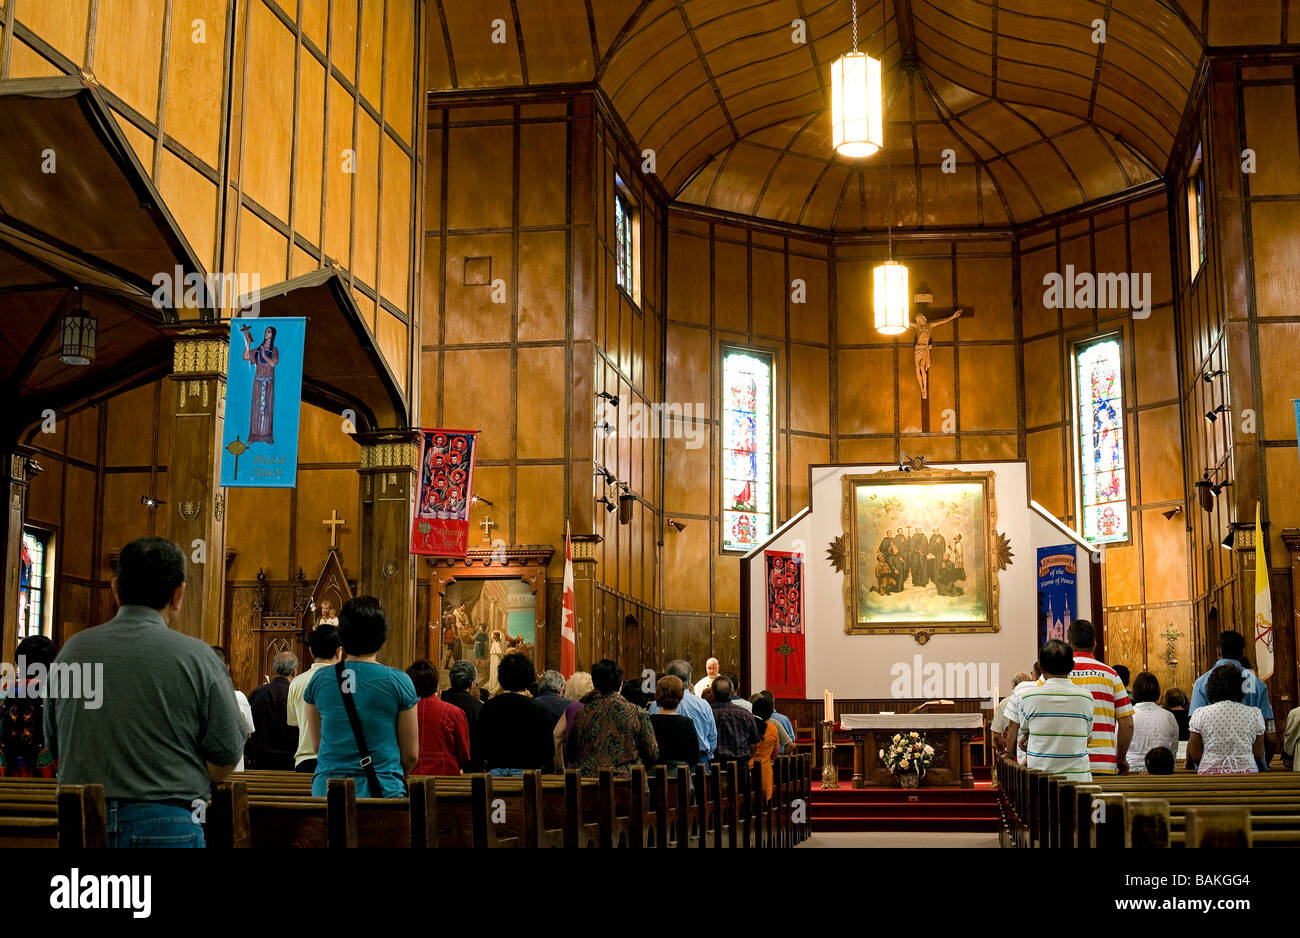 Canada, Ontario Province, Midland-Penetanguishene Region, Sainte Marie among the Hurons, Martyrdom Sanctuary Church - Stock Image